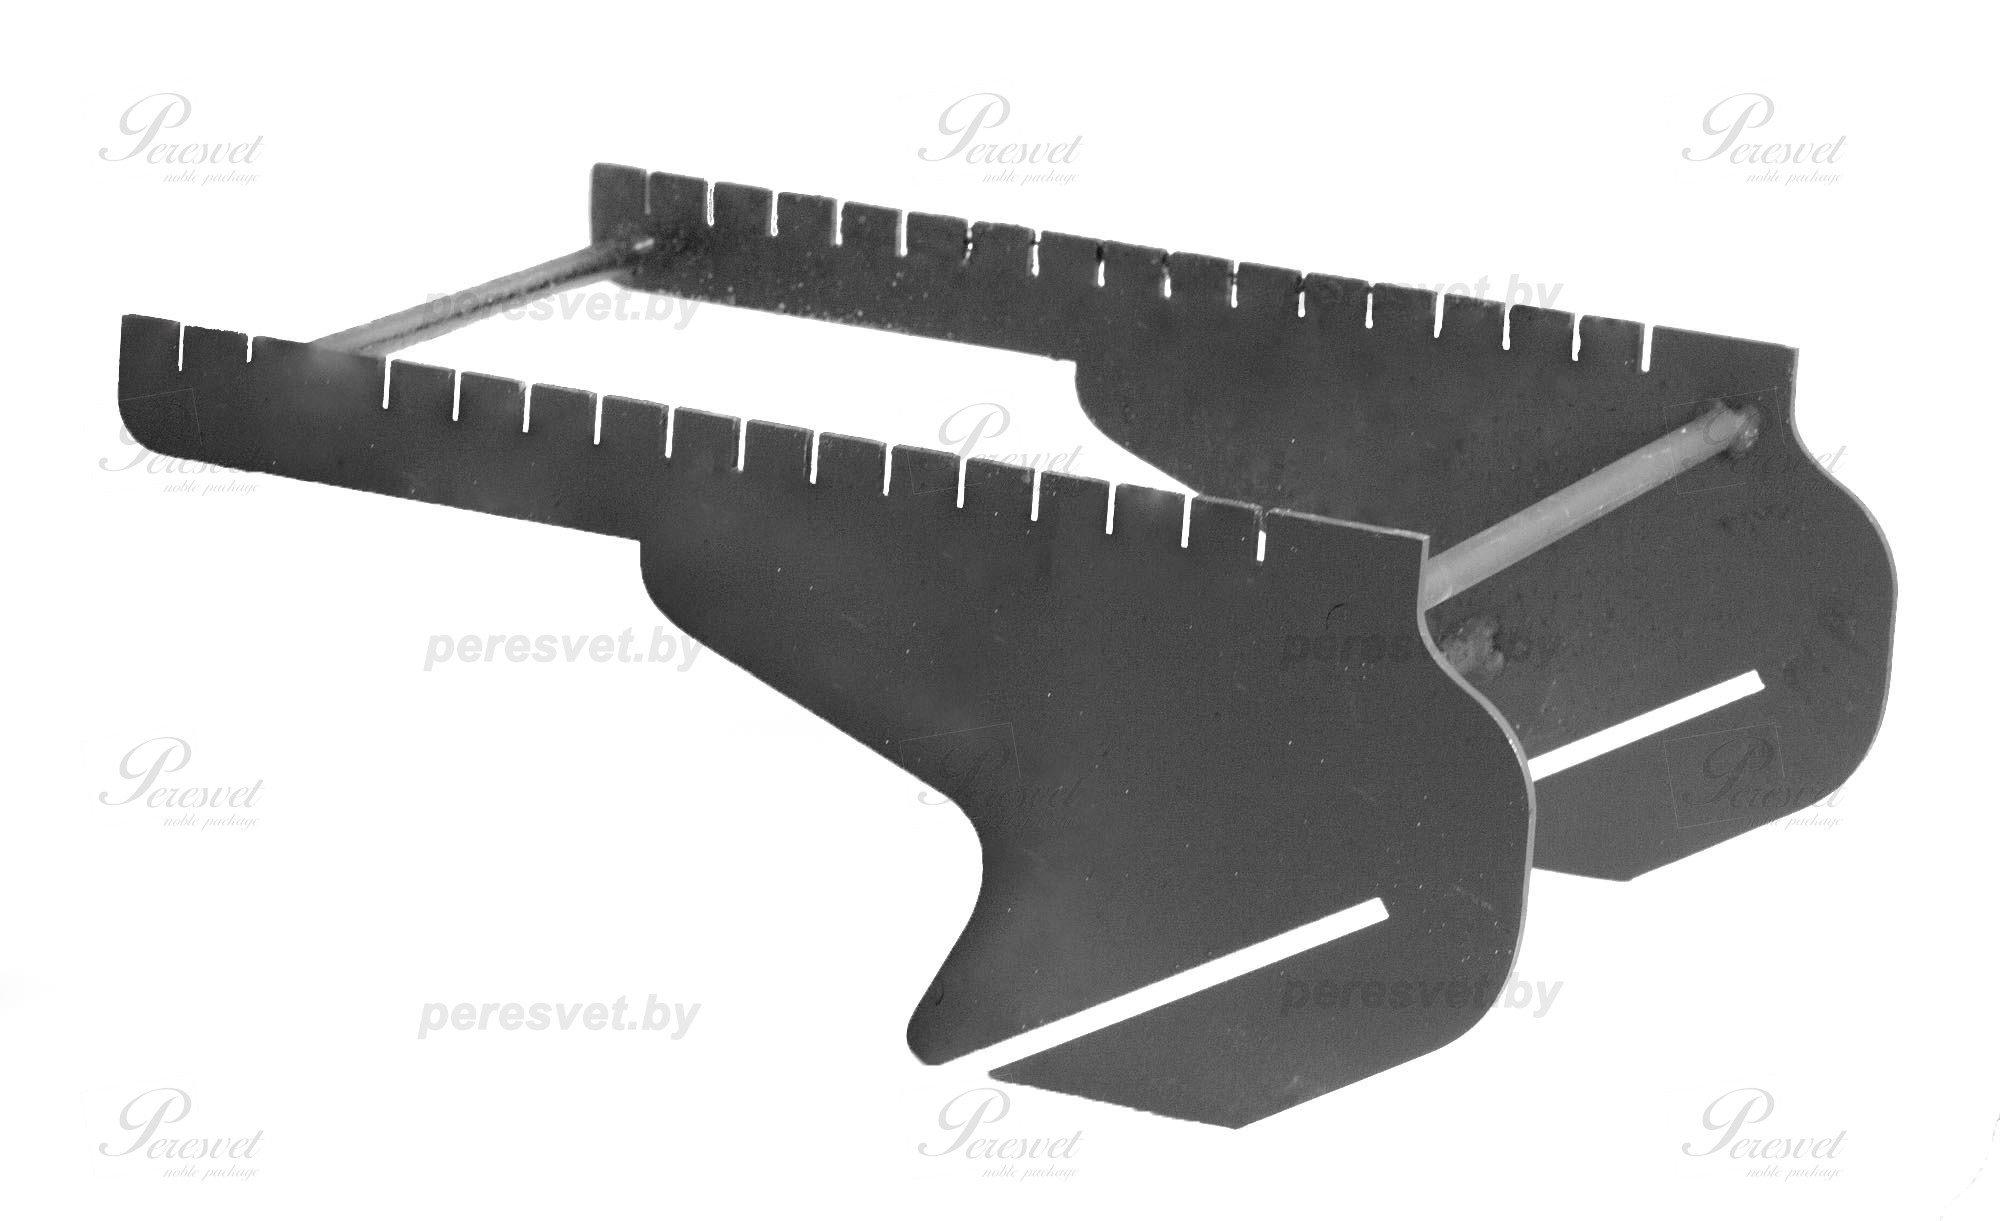 Шашлычный модуль к мангалу трансформер Сумрак стандарт на peresvet.by